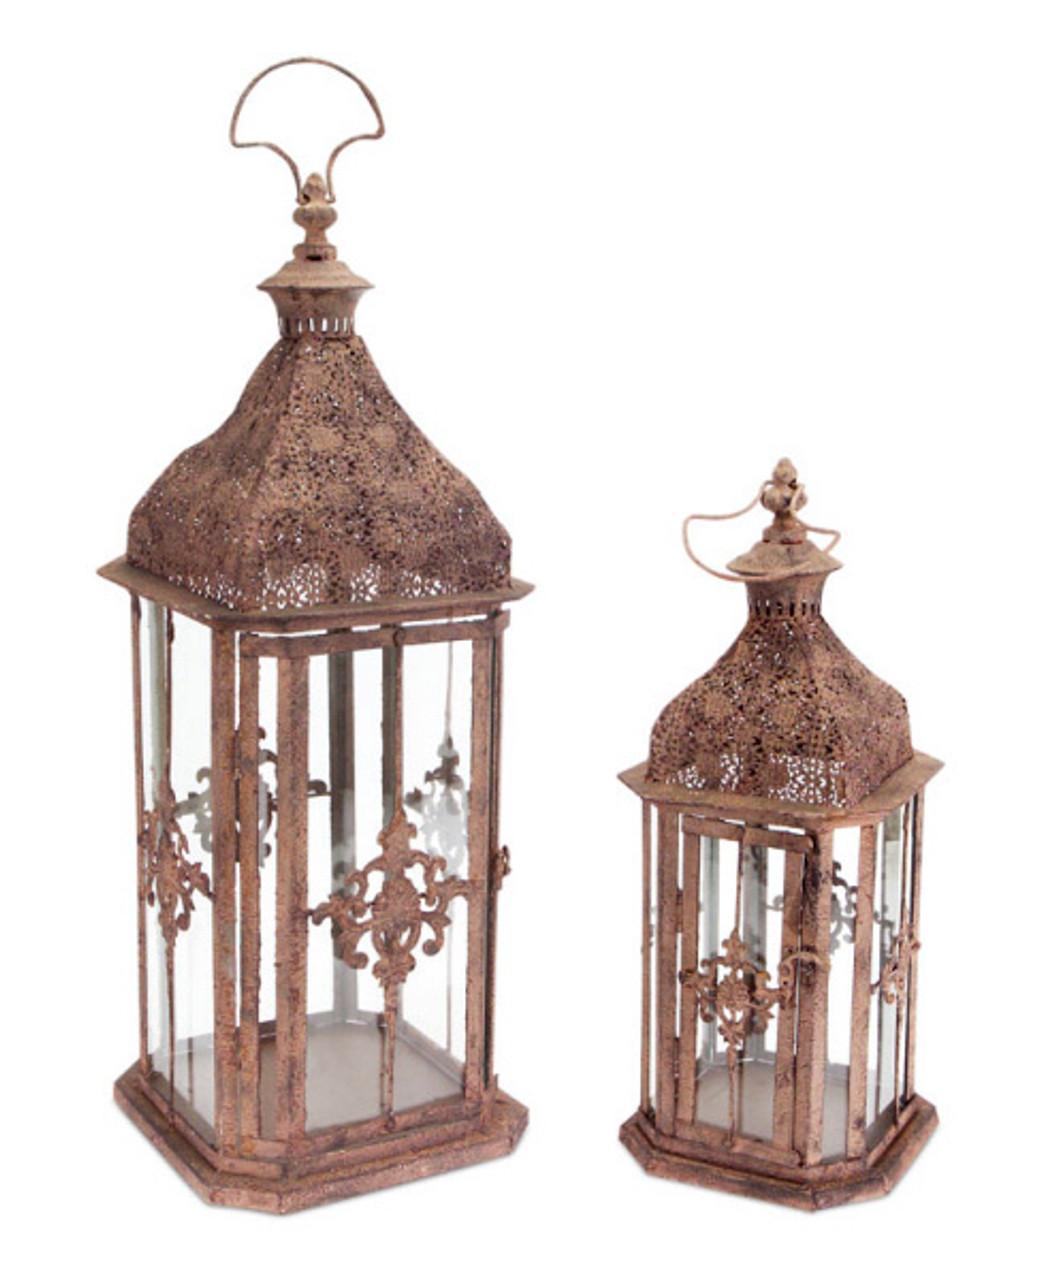 Set Of 2 Brick Brown Antique Rustic Pillar Candle Holder Lanterns 24